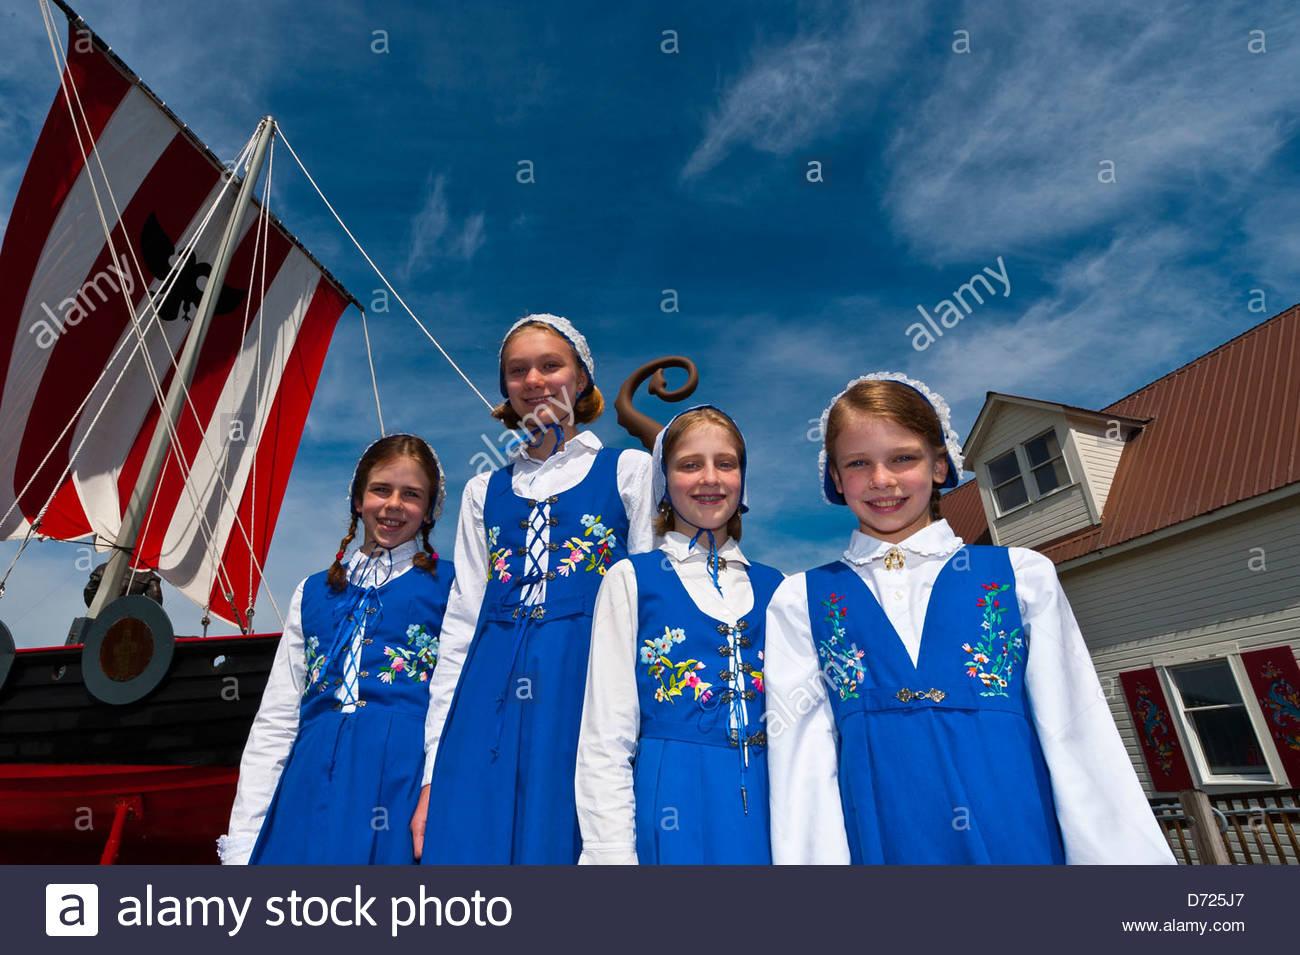 Local girls in Norwegian costume, Sons of Norway Hall, Petersburg, Southeast Alaska USA - Stock Image